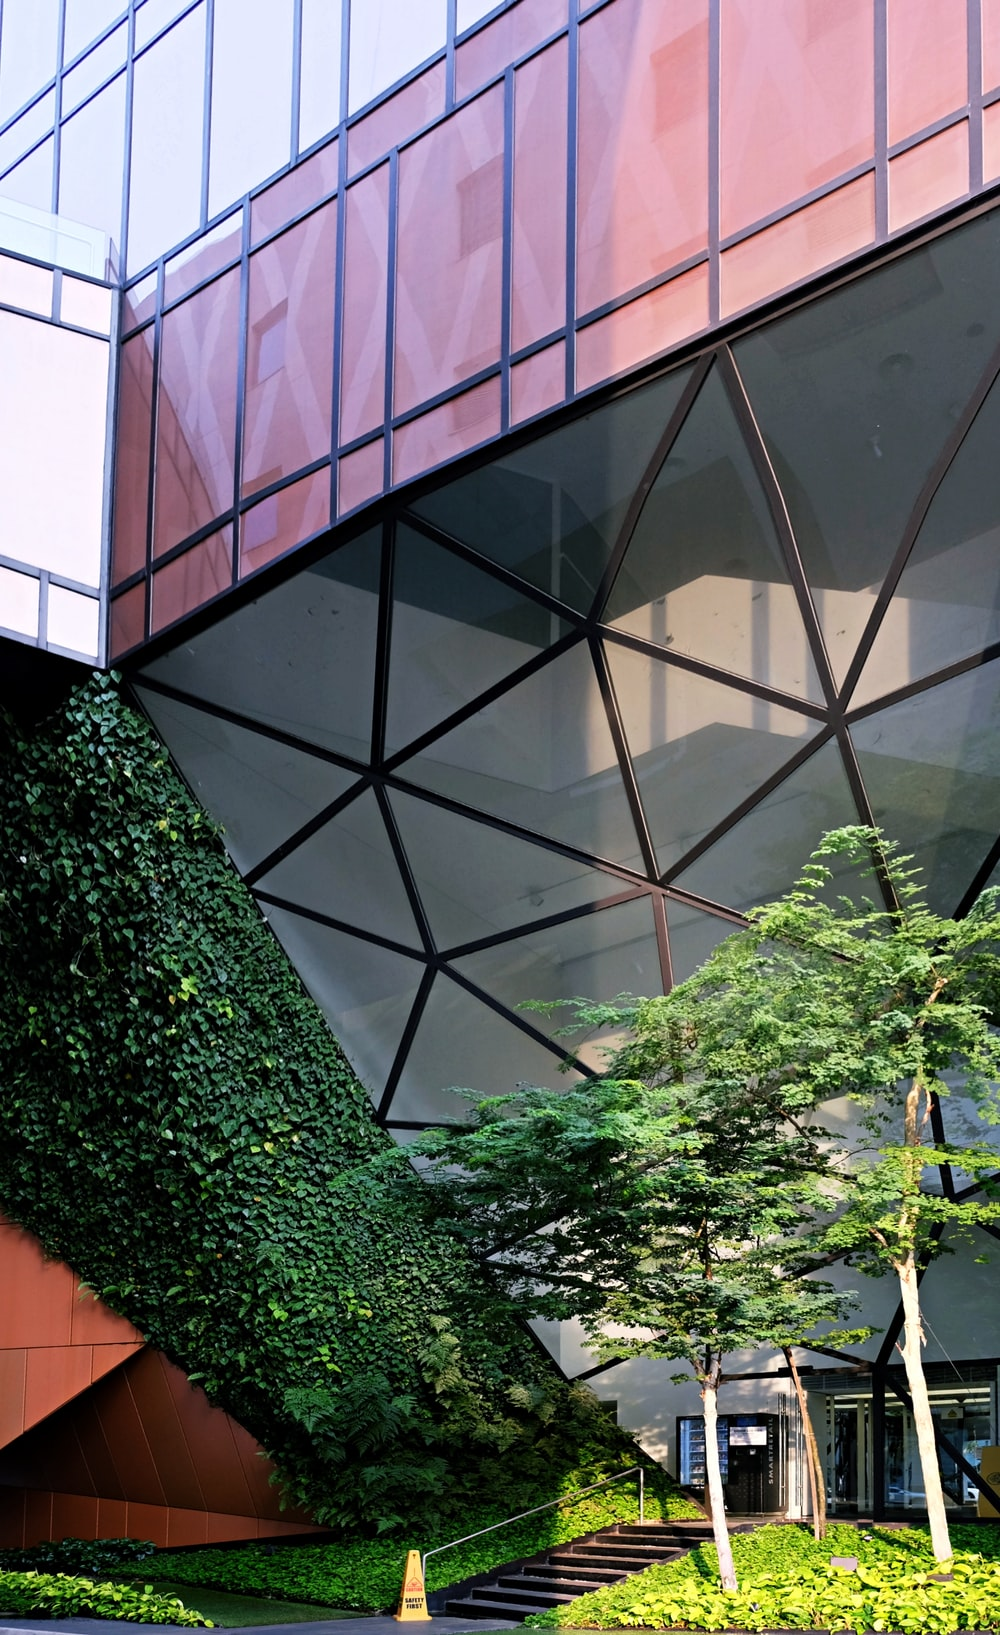 green plant near glass window